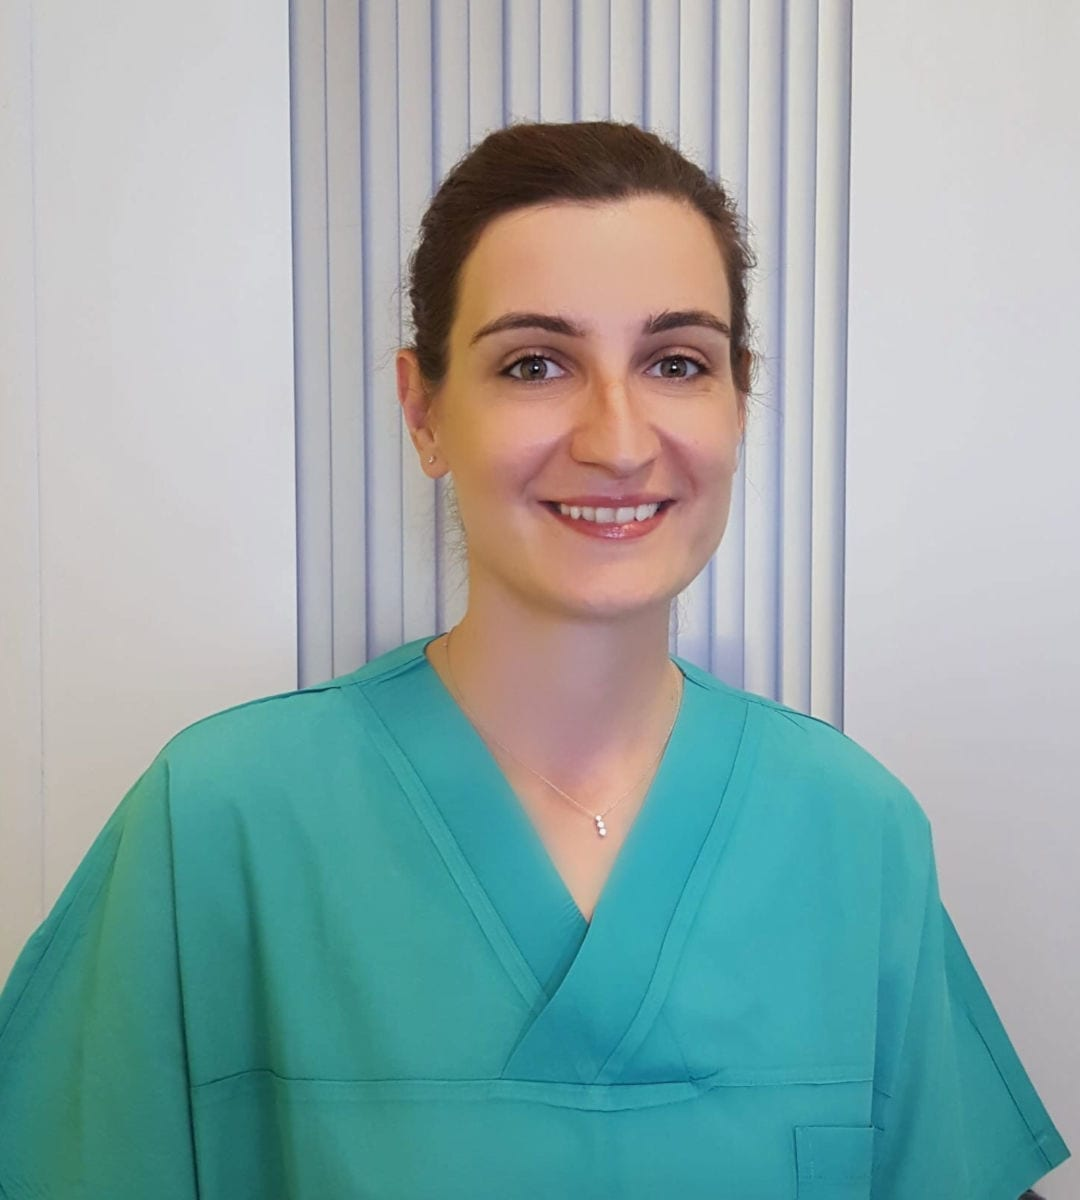 Elena Vezzoli